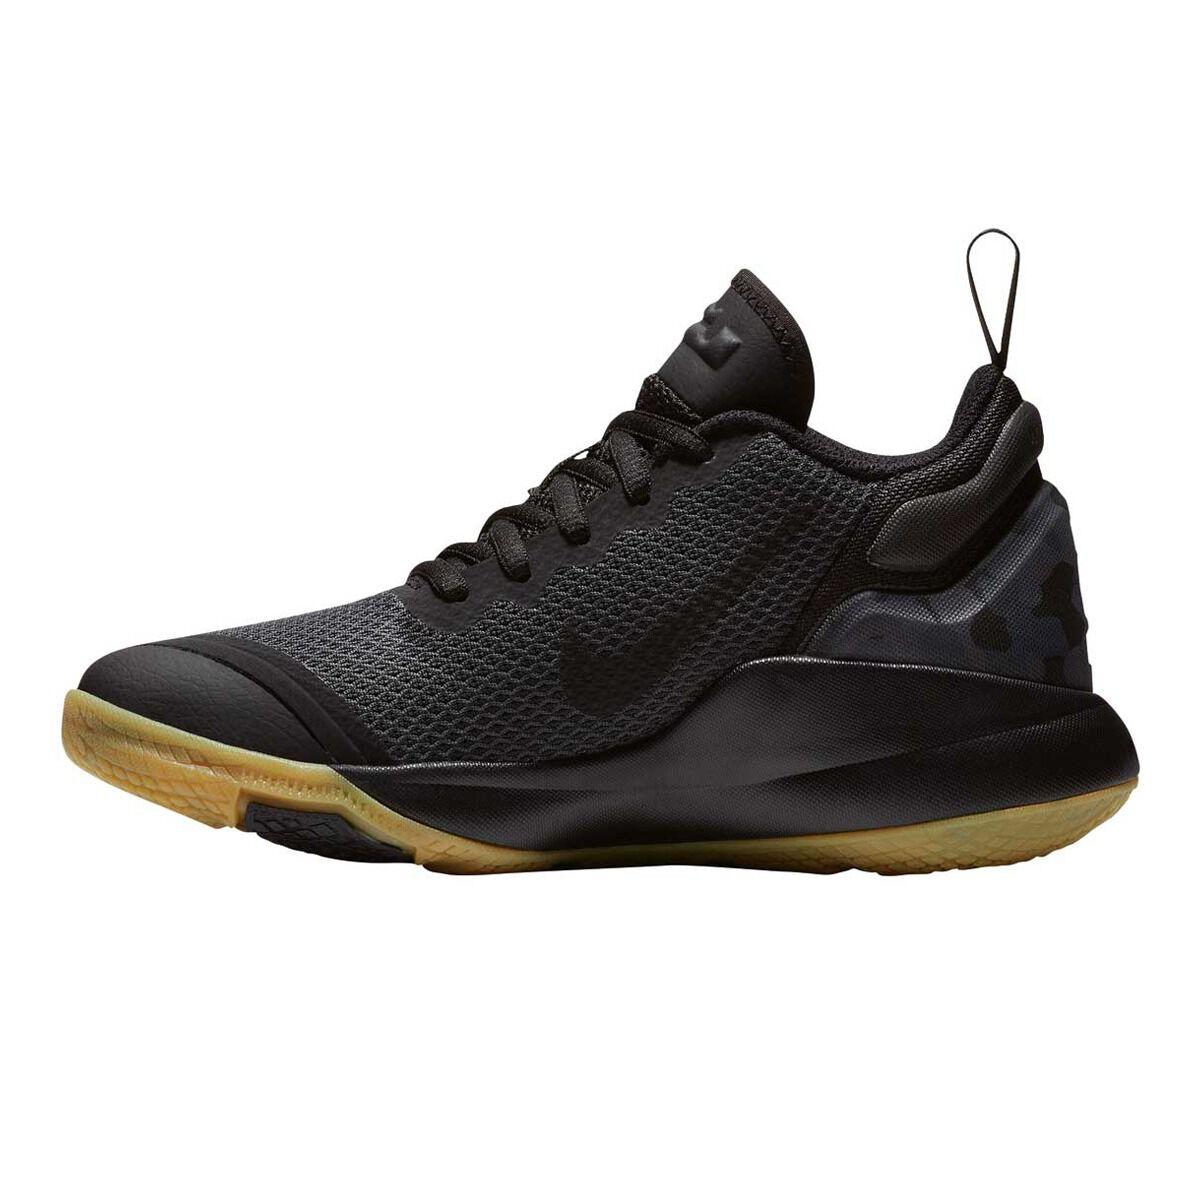 cf709765a667 ... shop nike lebron witness ii boys basketball shoes black brown us 4 black  brown 55af0 6a609